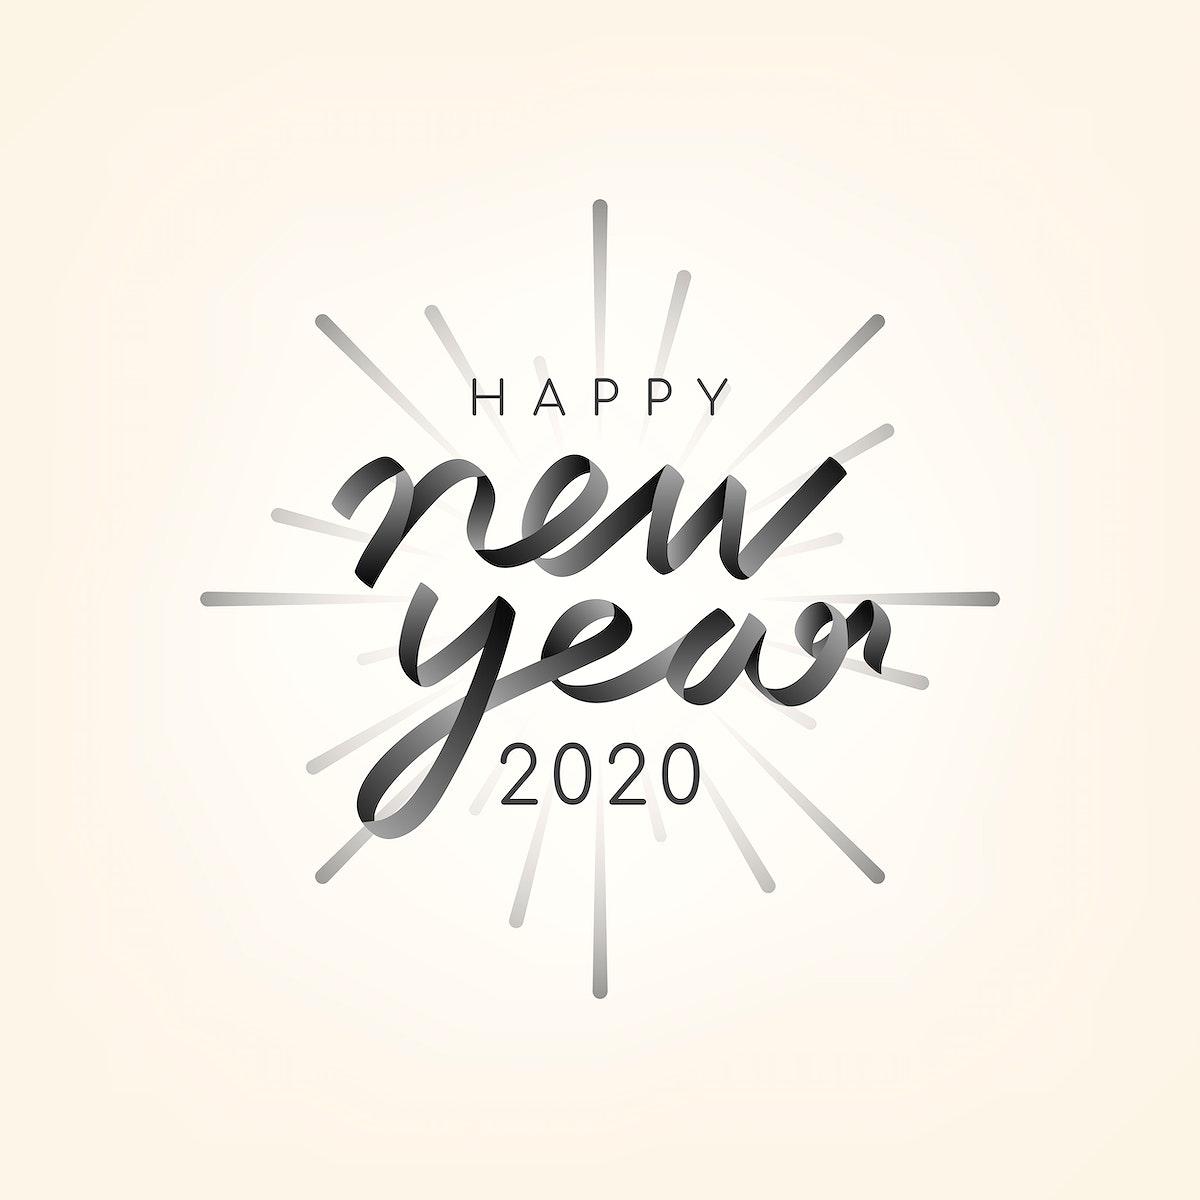 Happy New Year 2020 typography illustration